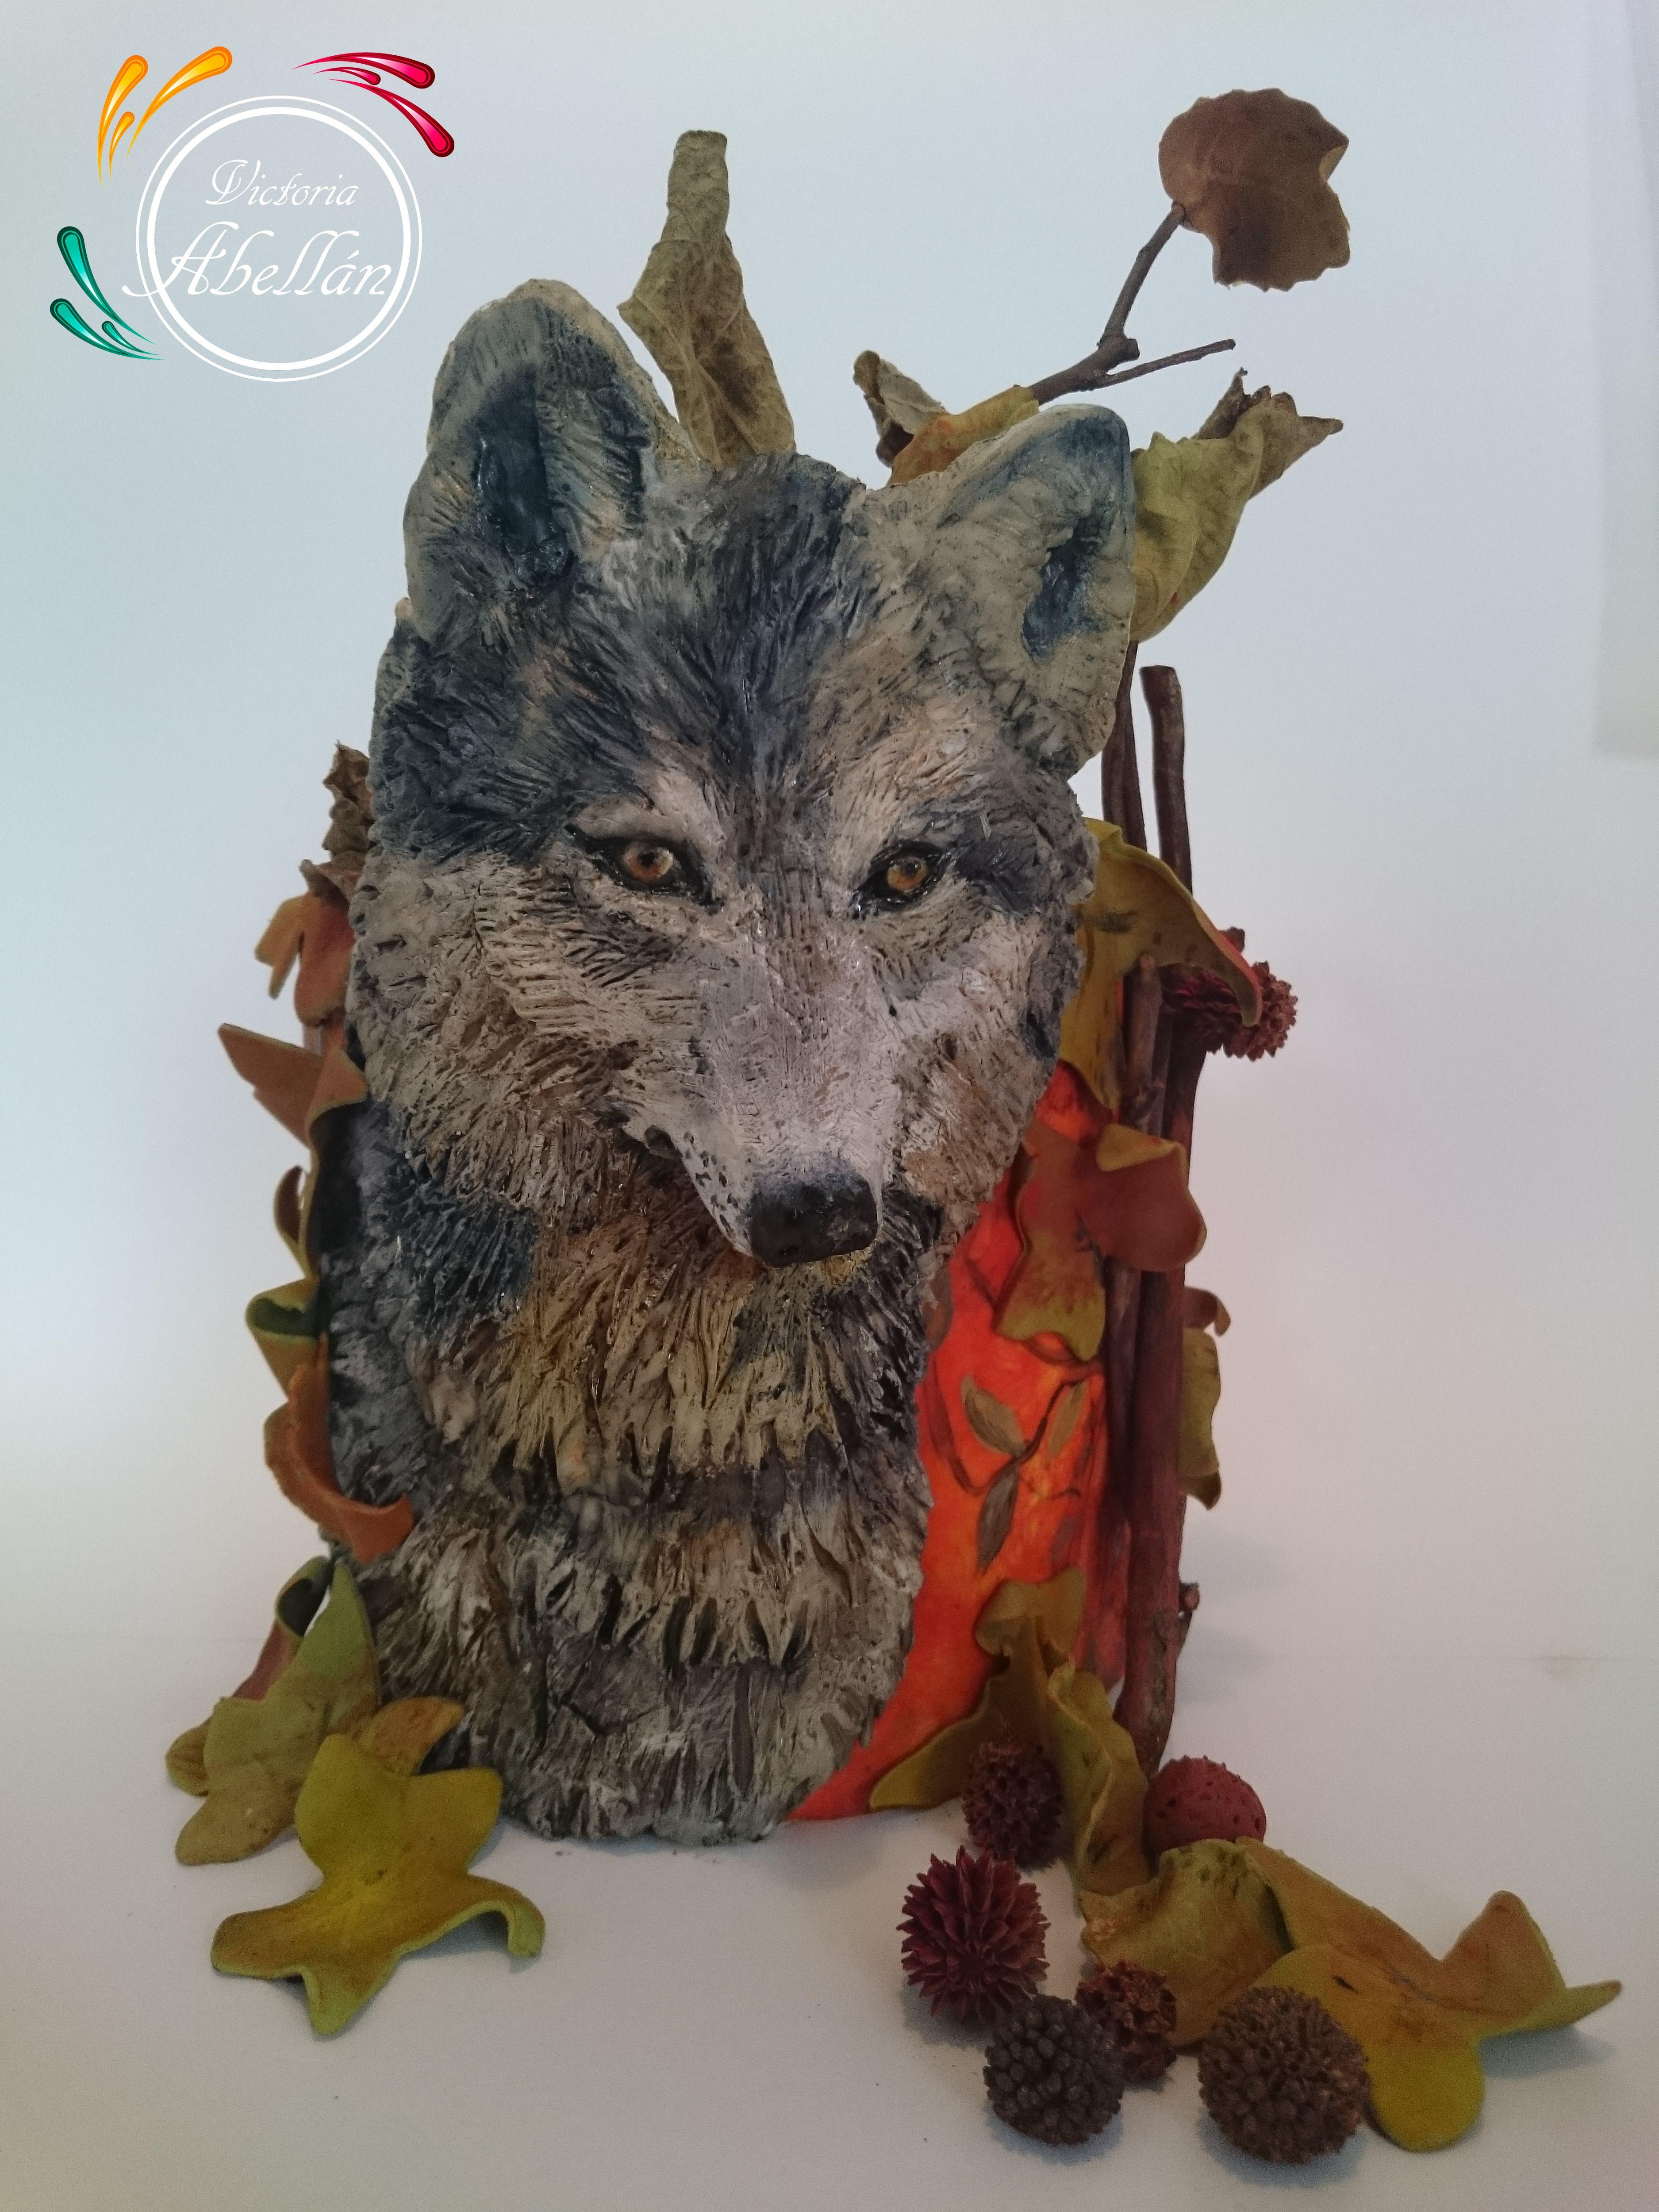 Animal-Rights-Victoria-Abellán-Guardiola-Victoria-Abellán-Iberian-Wolf.jpg#asset:13740